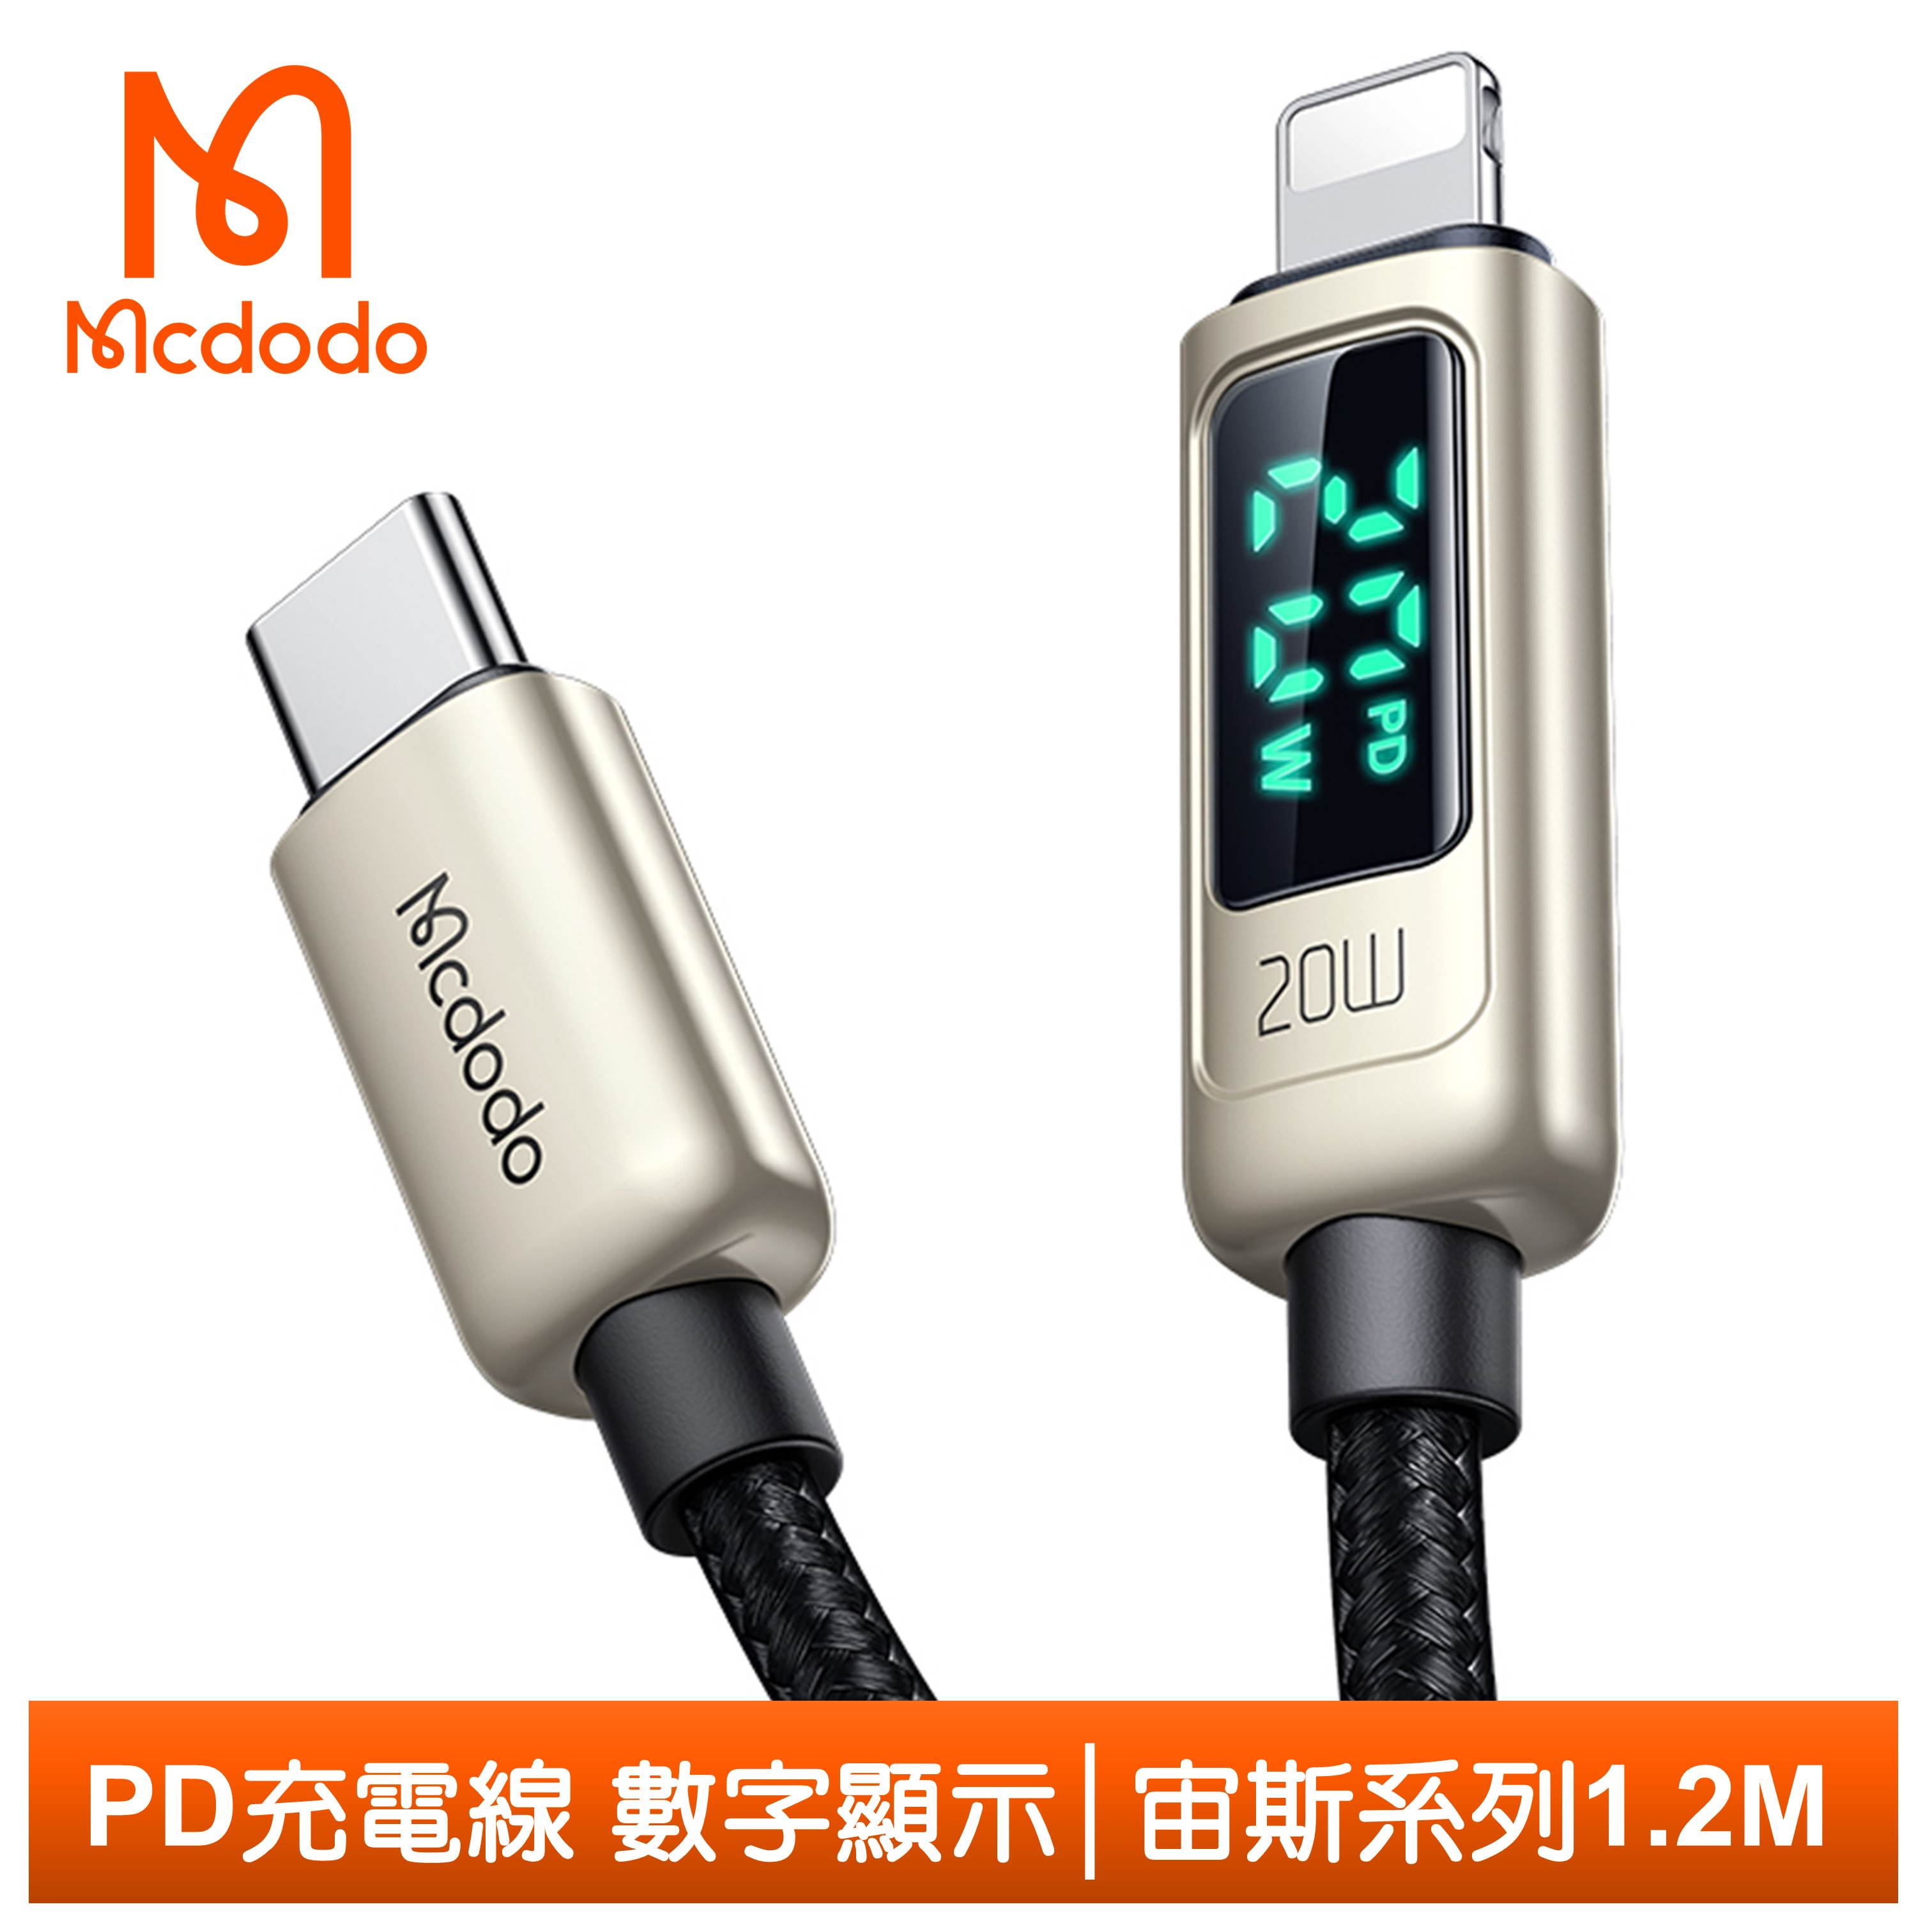 Mcdodo麥多多台灣官方 PD/Lightning/Type-C/iPhone充電線傳輸線快充線編織 功率數顯 宙斯系列 1.2M 銀色